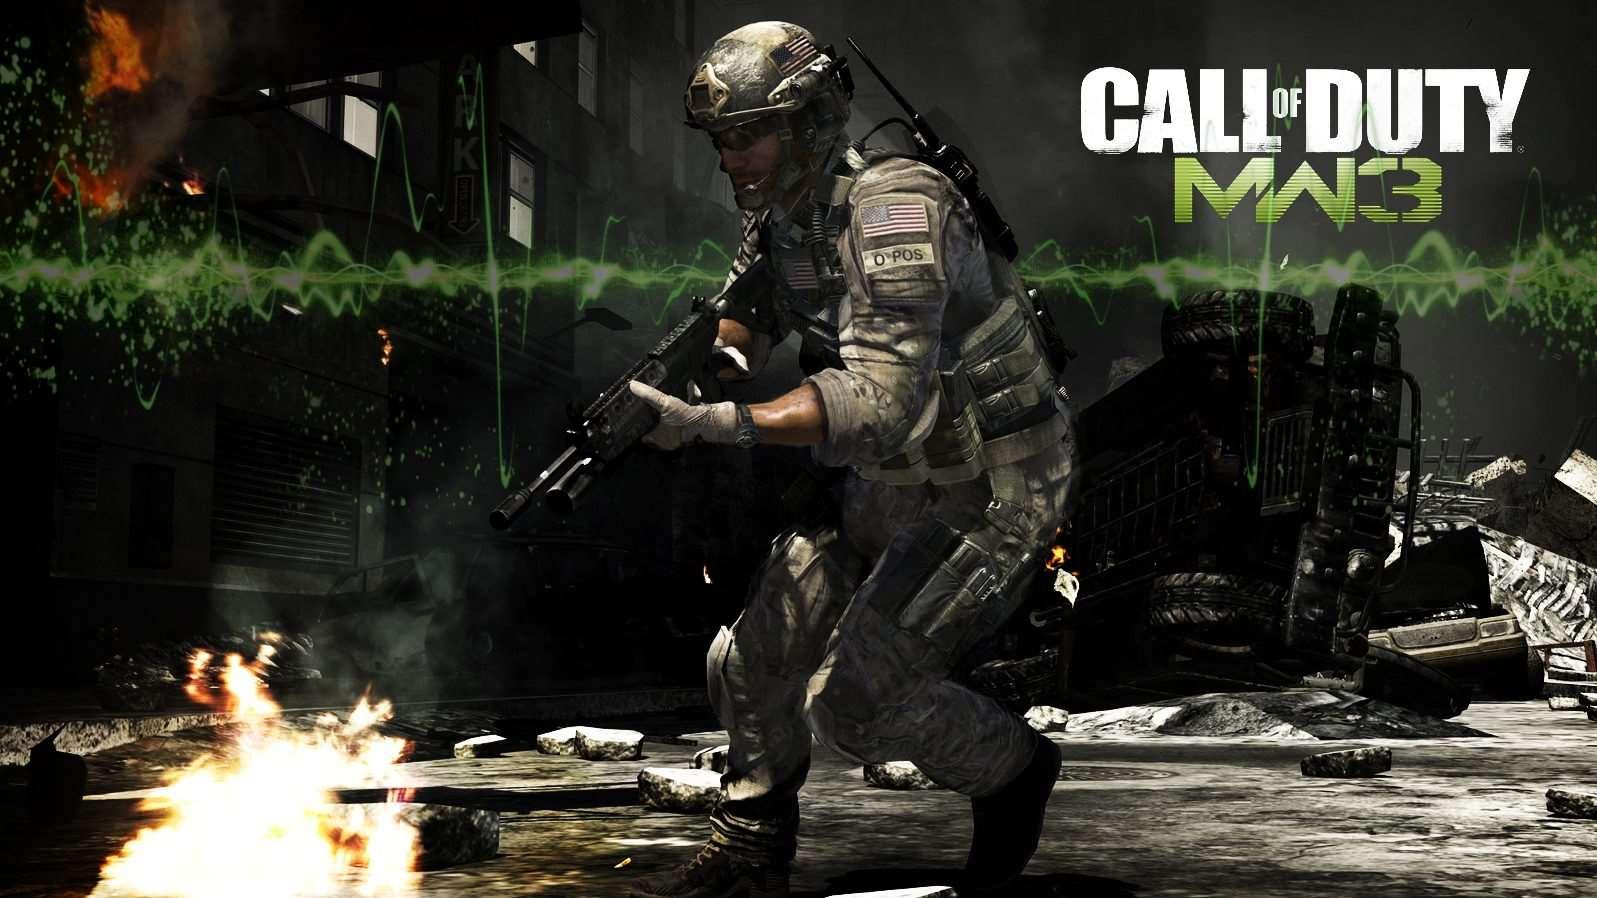 [CW2] Modern Warfare 3 Redux